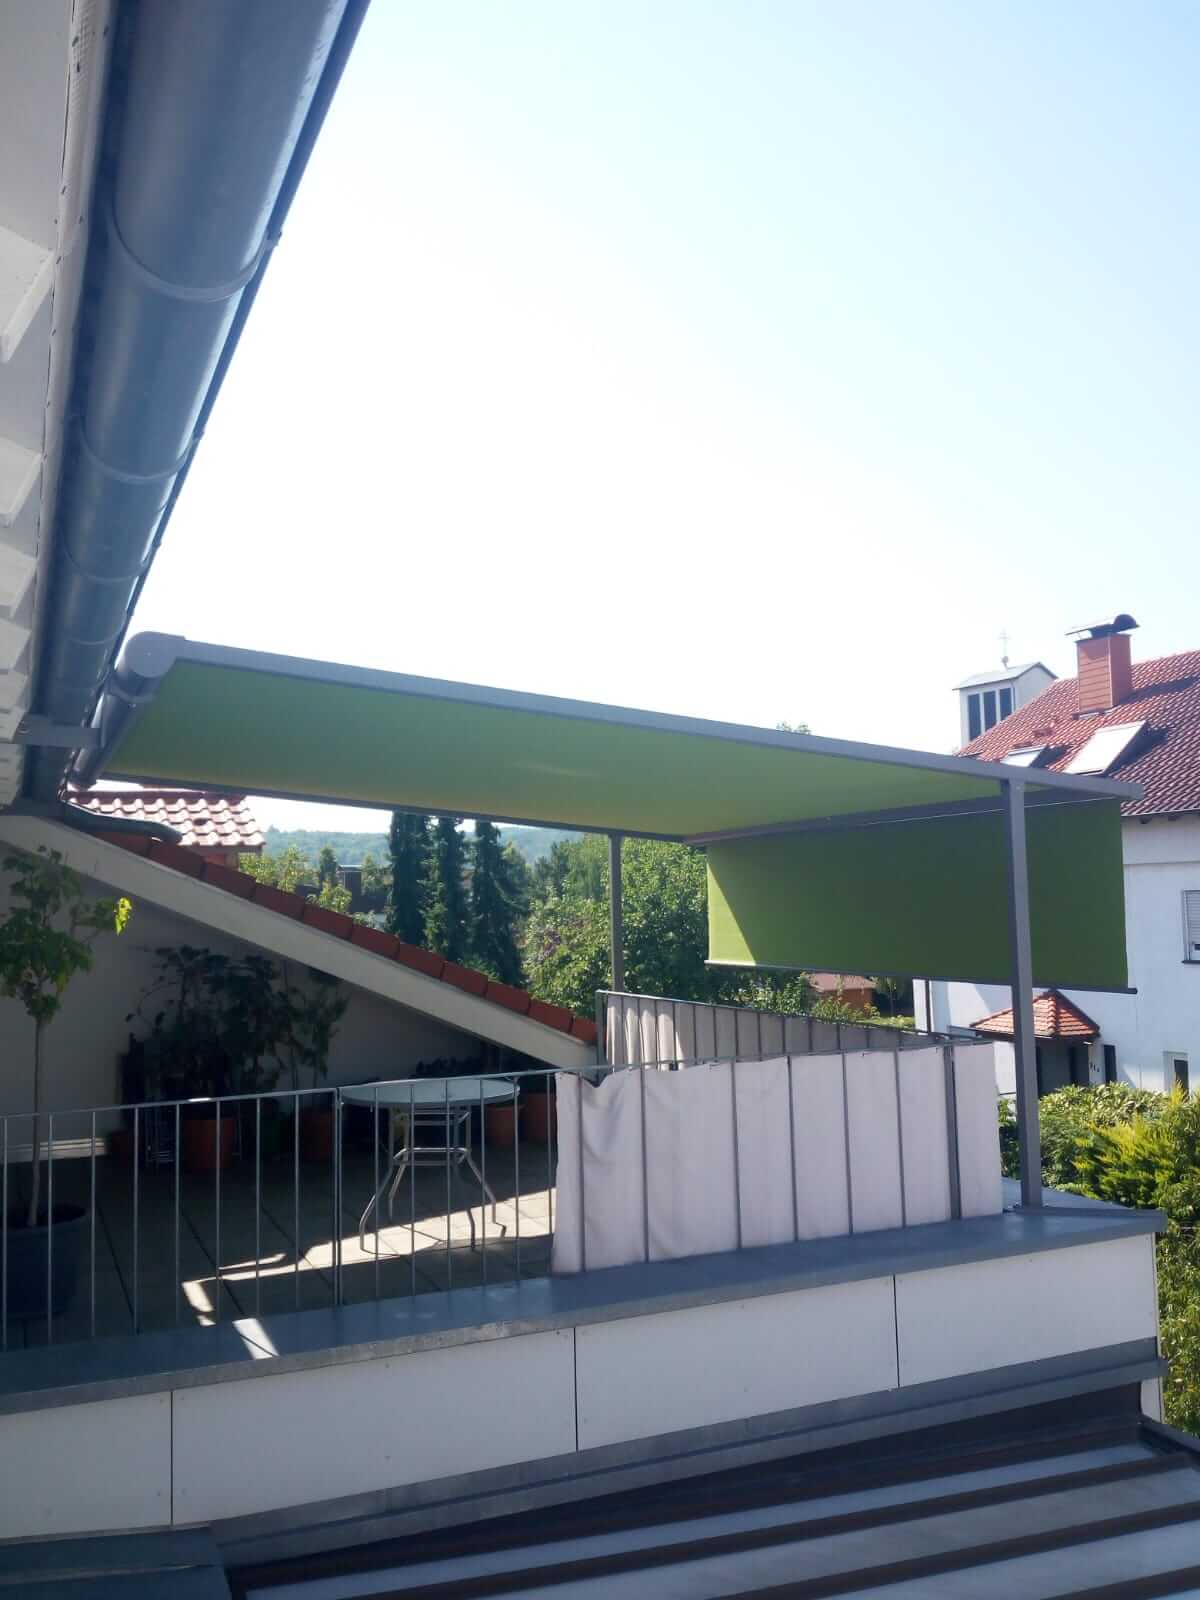 balkon_sonnenschutz_grueb-markise_ueberdachung